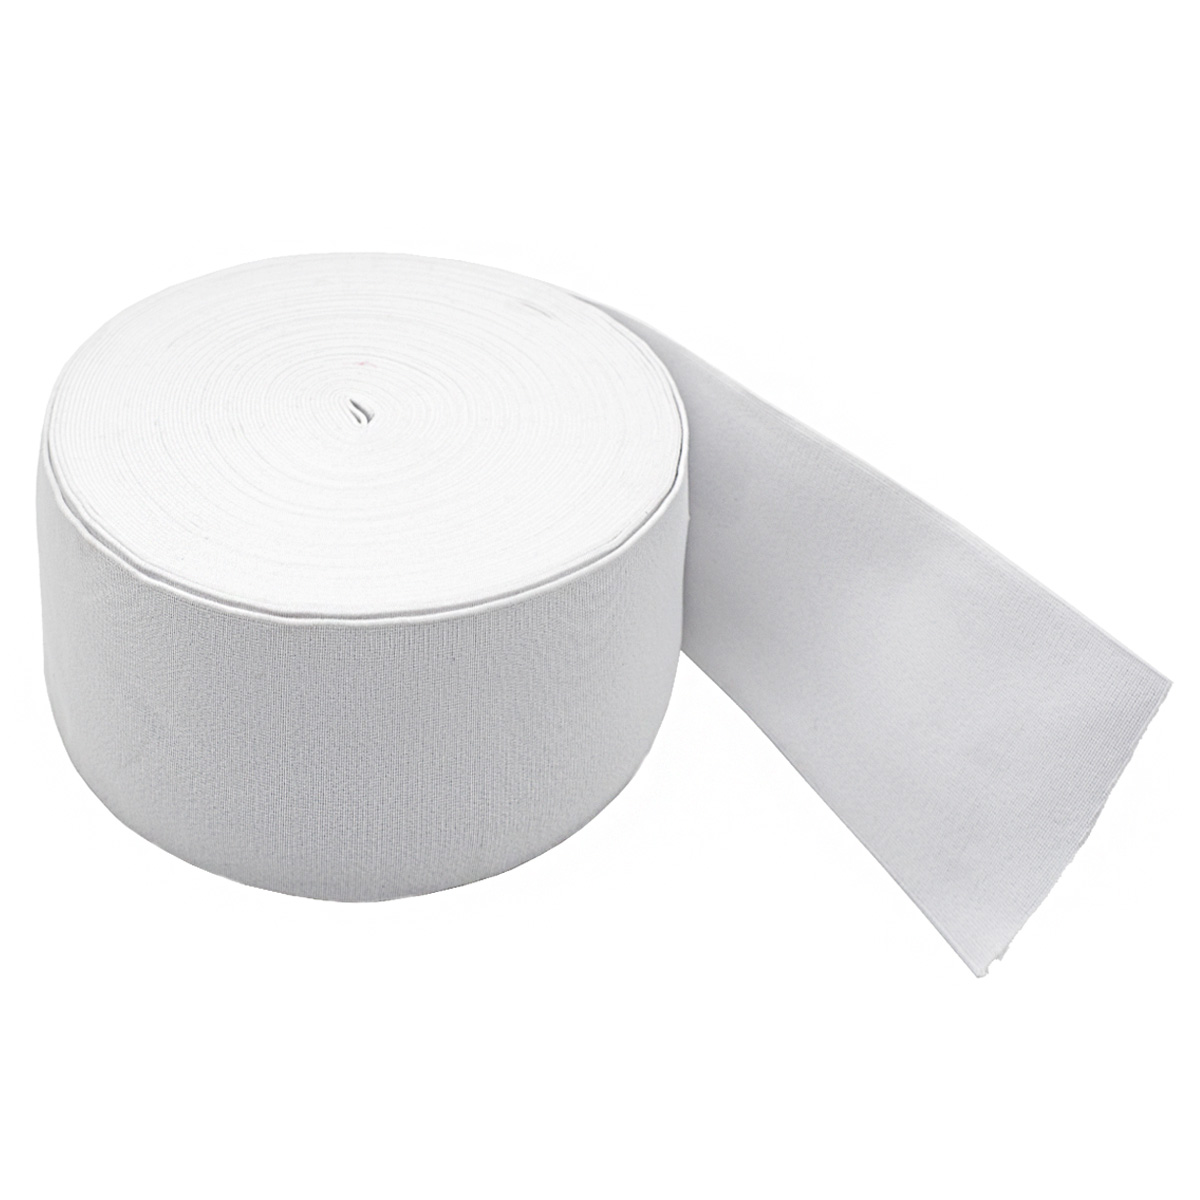 50100Б Резинка башмачная 100мм*25м, белая